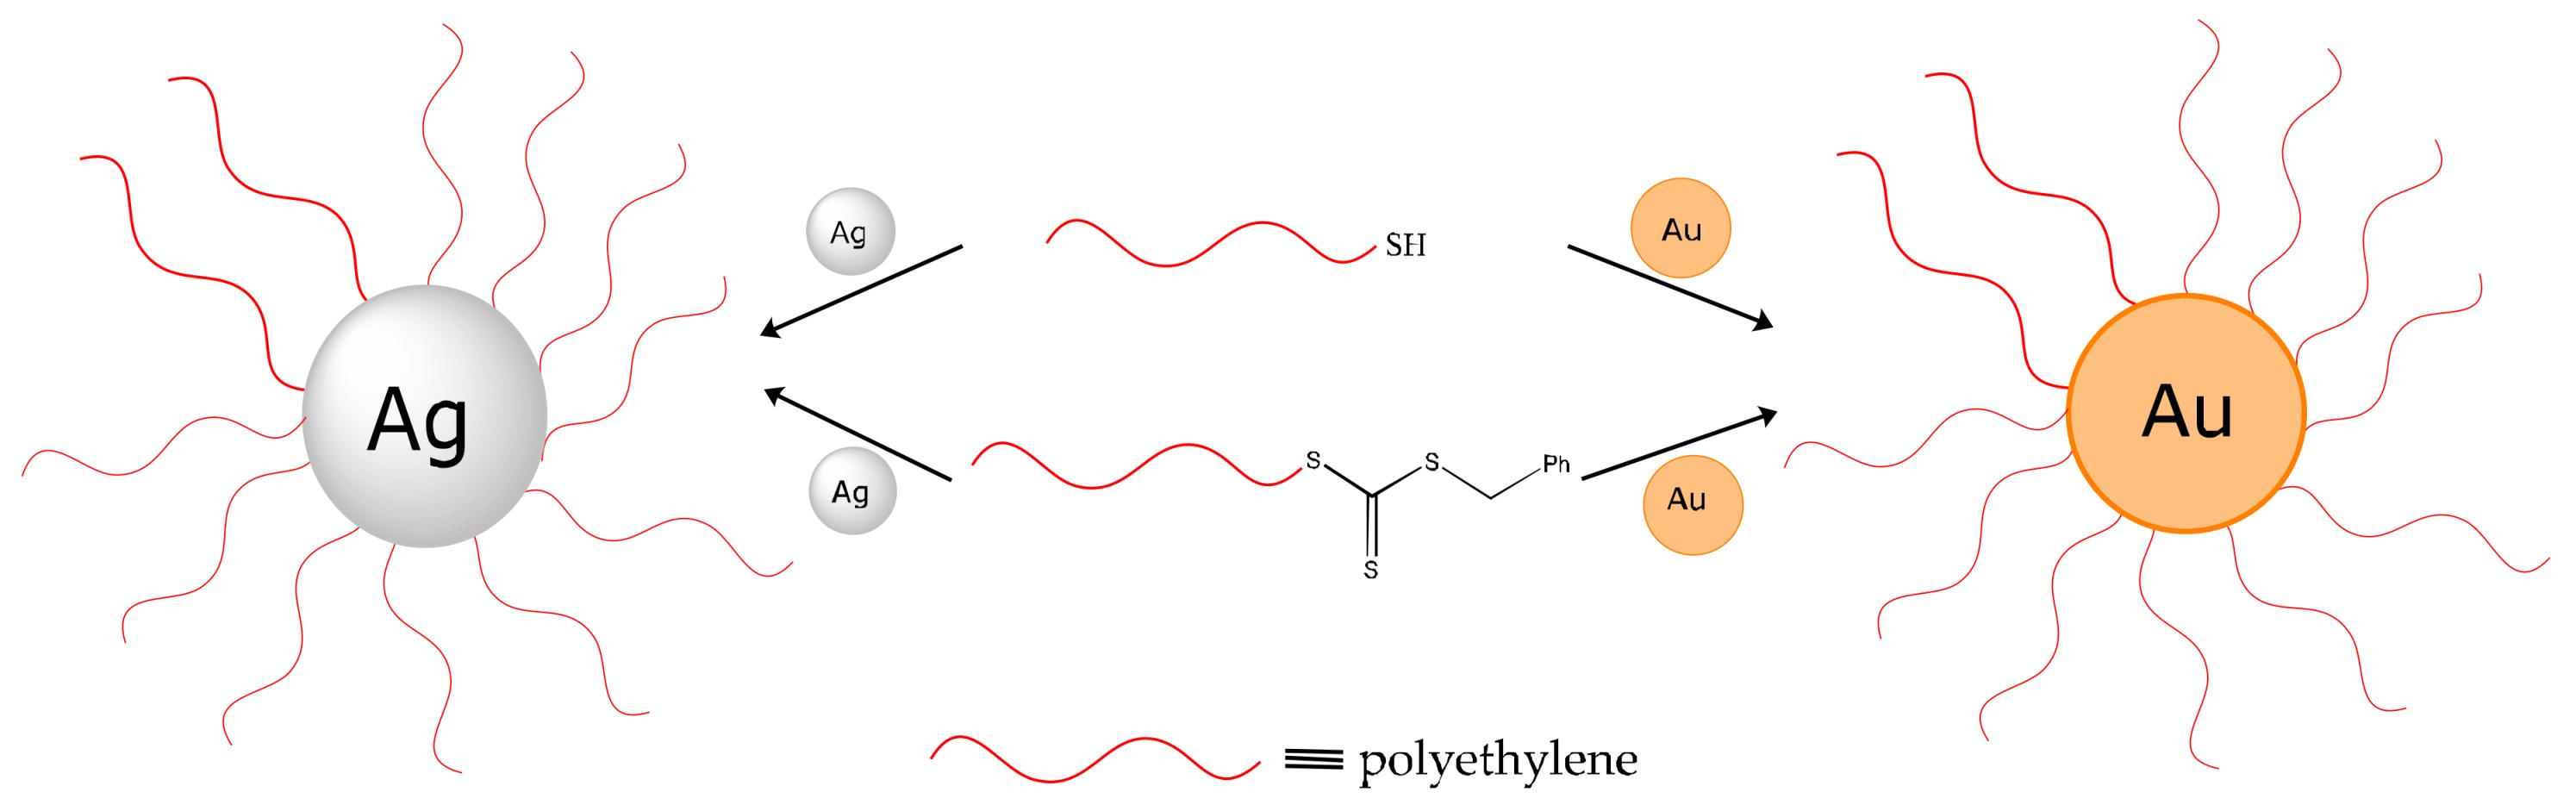 Olefin Polymerization with Ziegler-Natta Catalyst